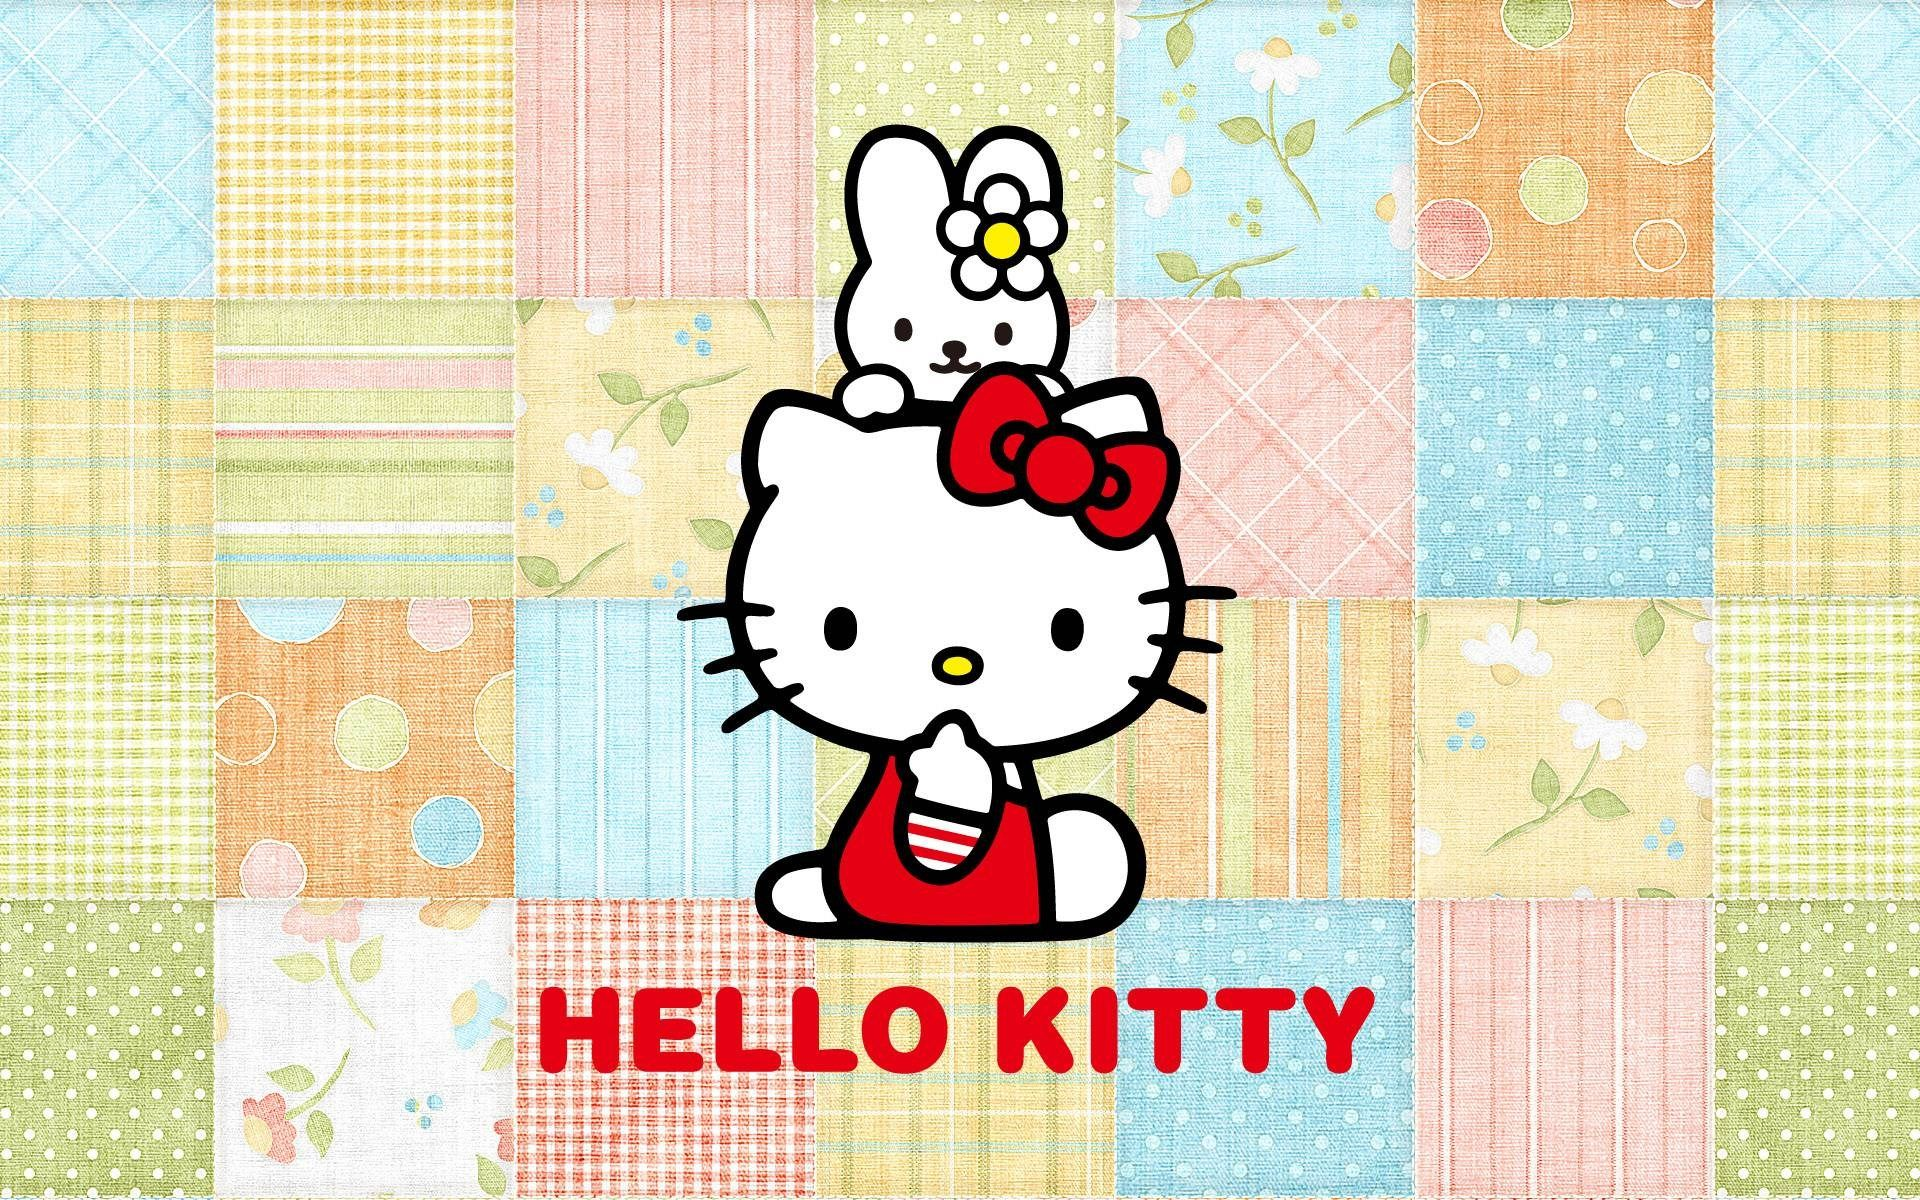 Amazing Wallpaper Hello Kitty Facebook - a4a3c50e8c9dbfc1bdbe7d67b0caee00  HD_453658.jpg